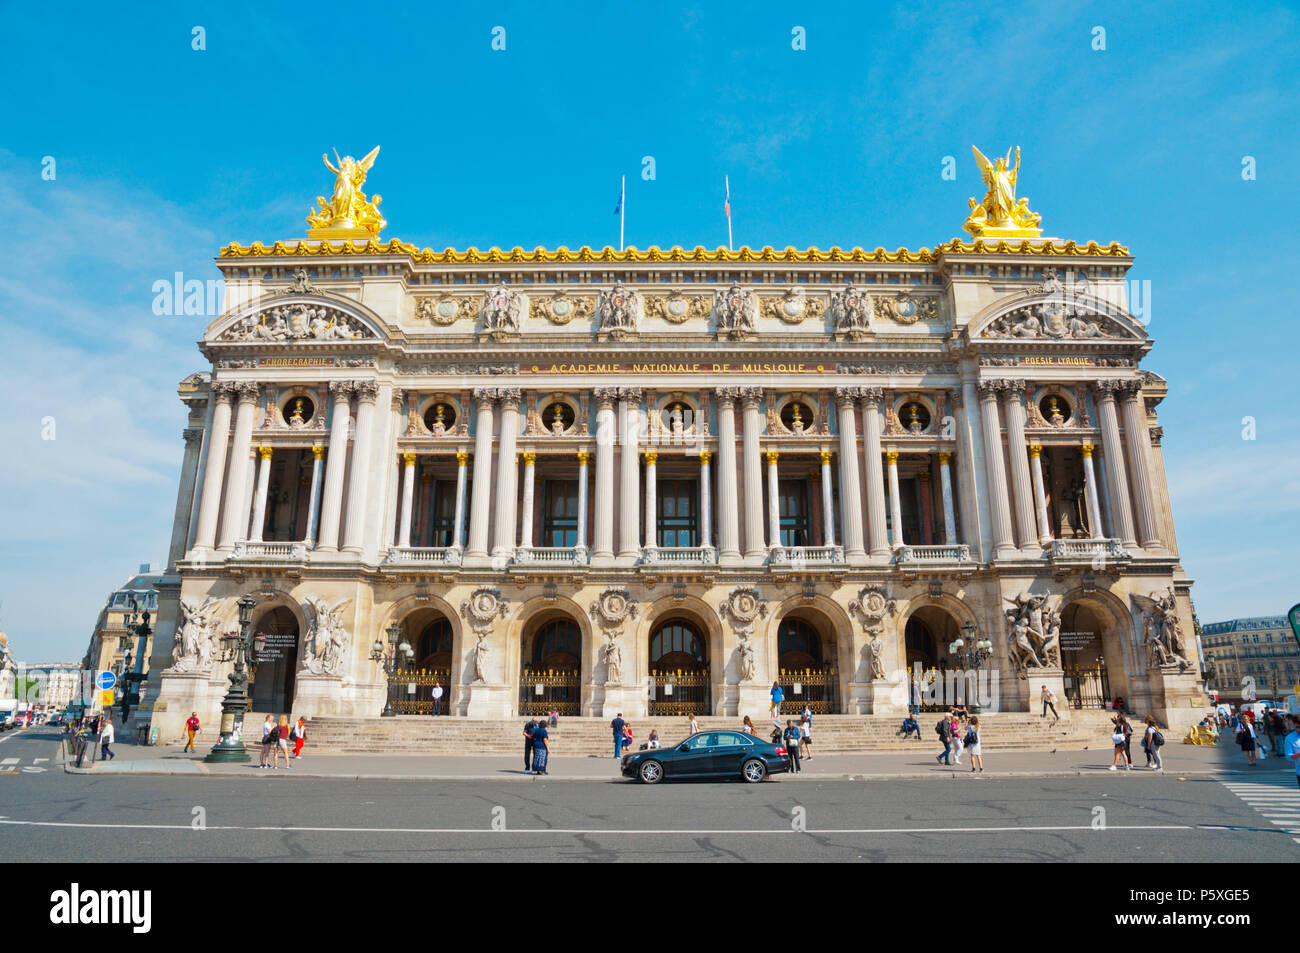 Opera House, Palais Garnier, Place de l'Opera, Paris, France - Stock Image